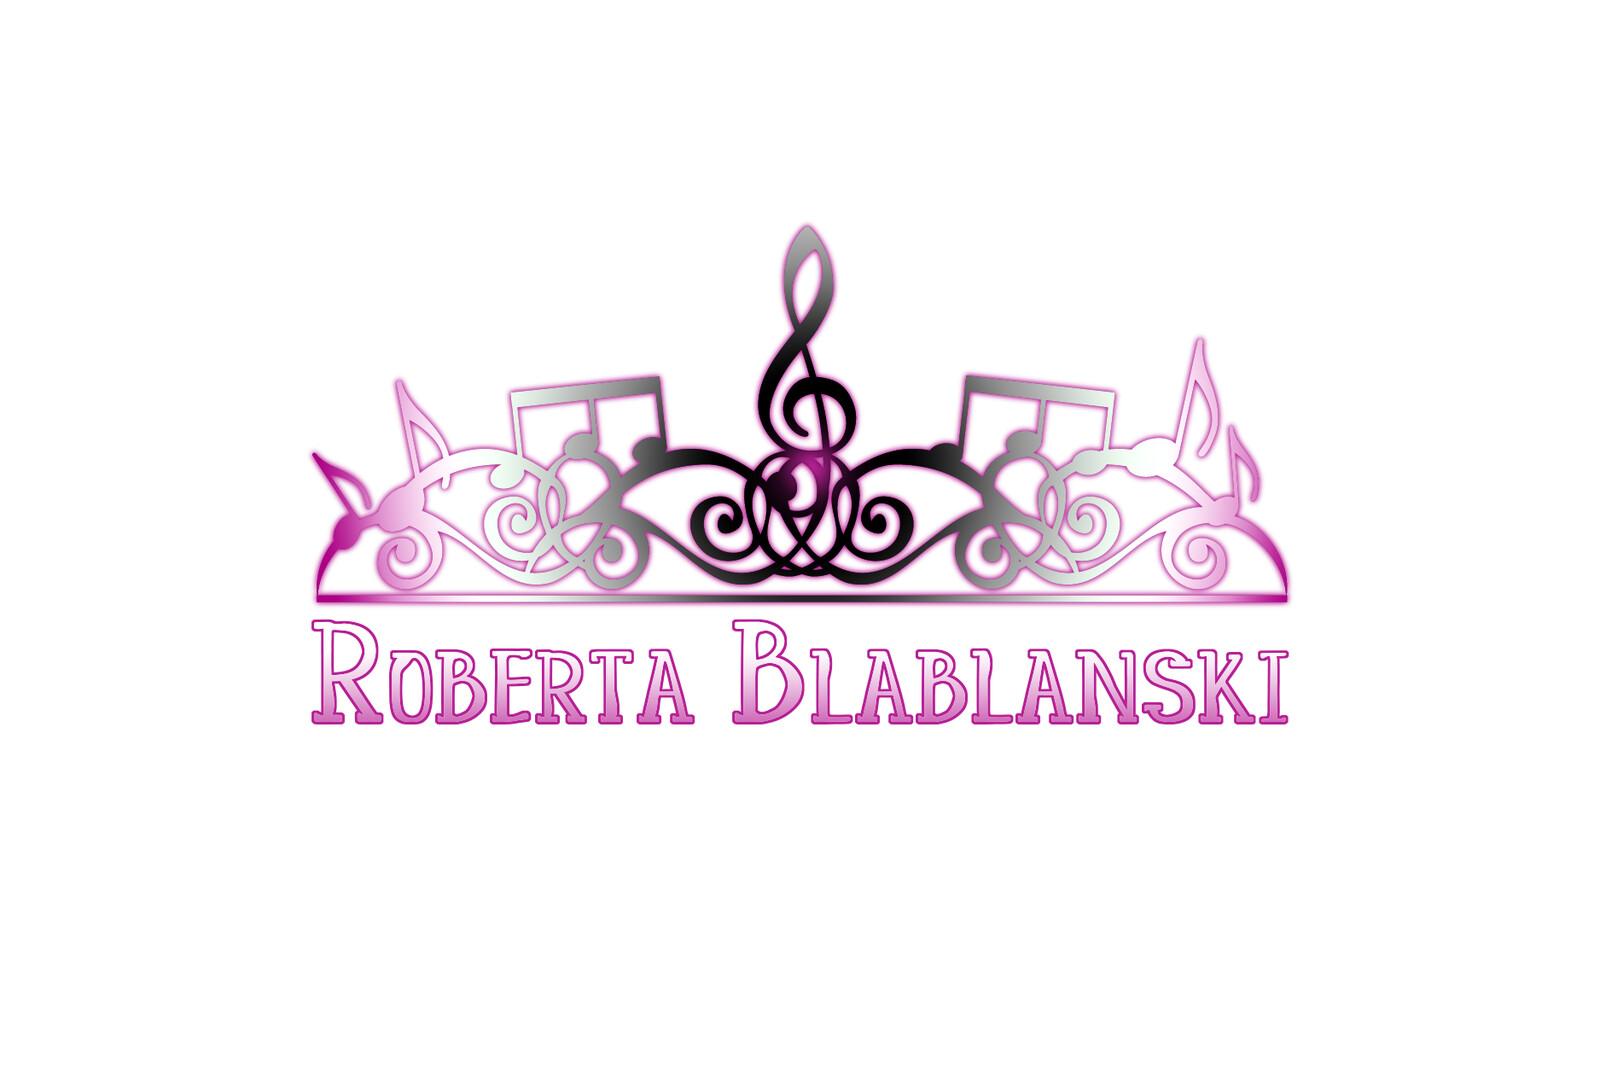 Branding: Roberta Blablanski